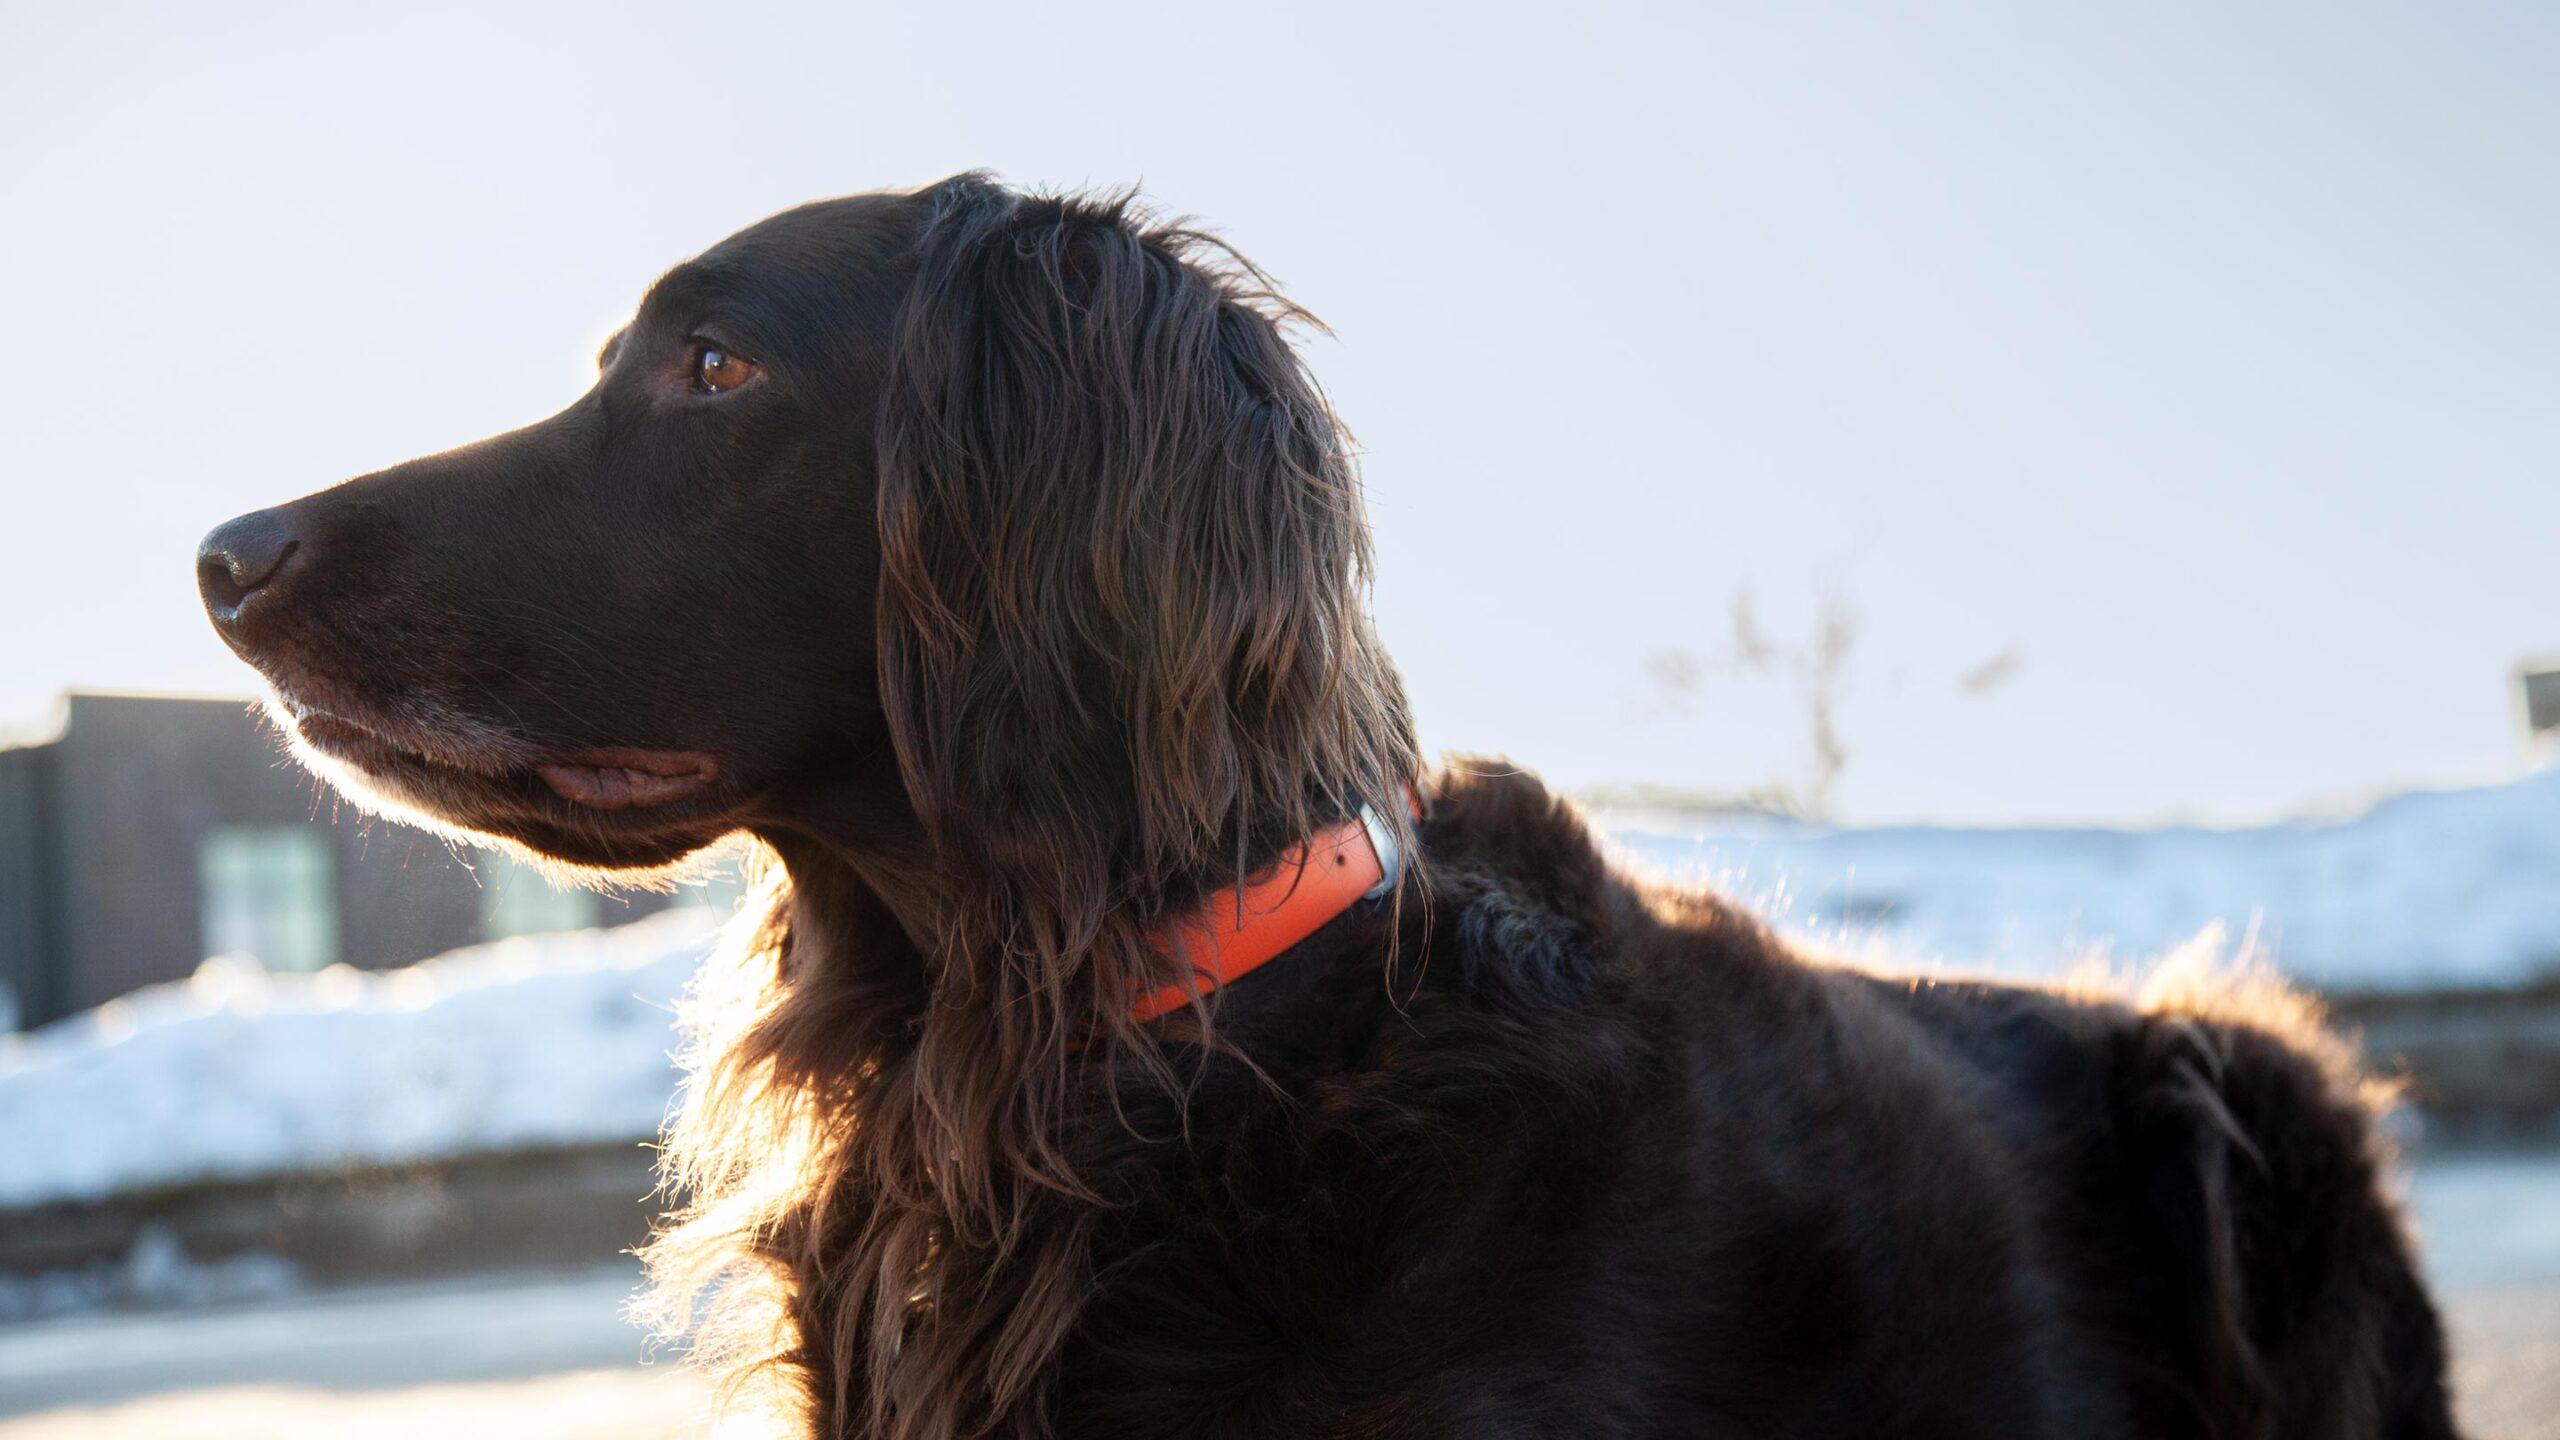 Deustch langhaar dog